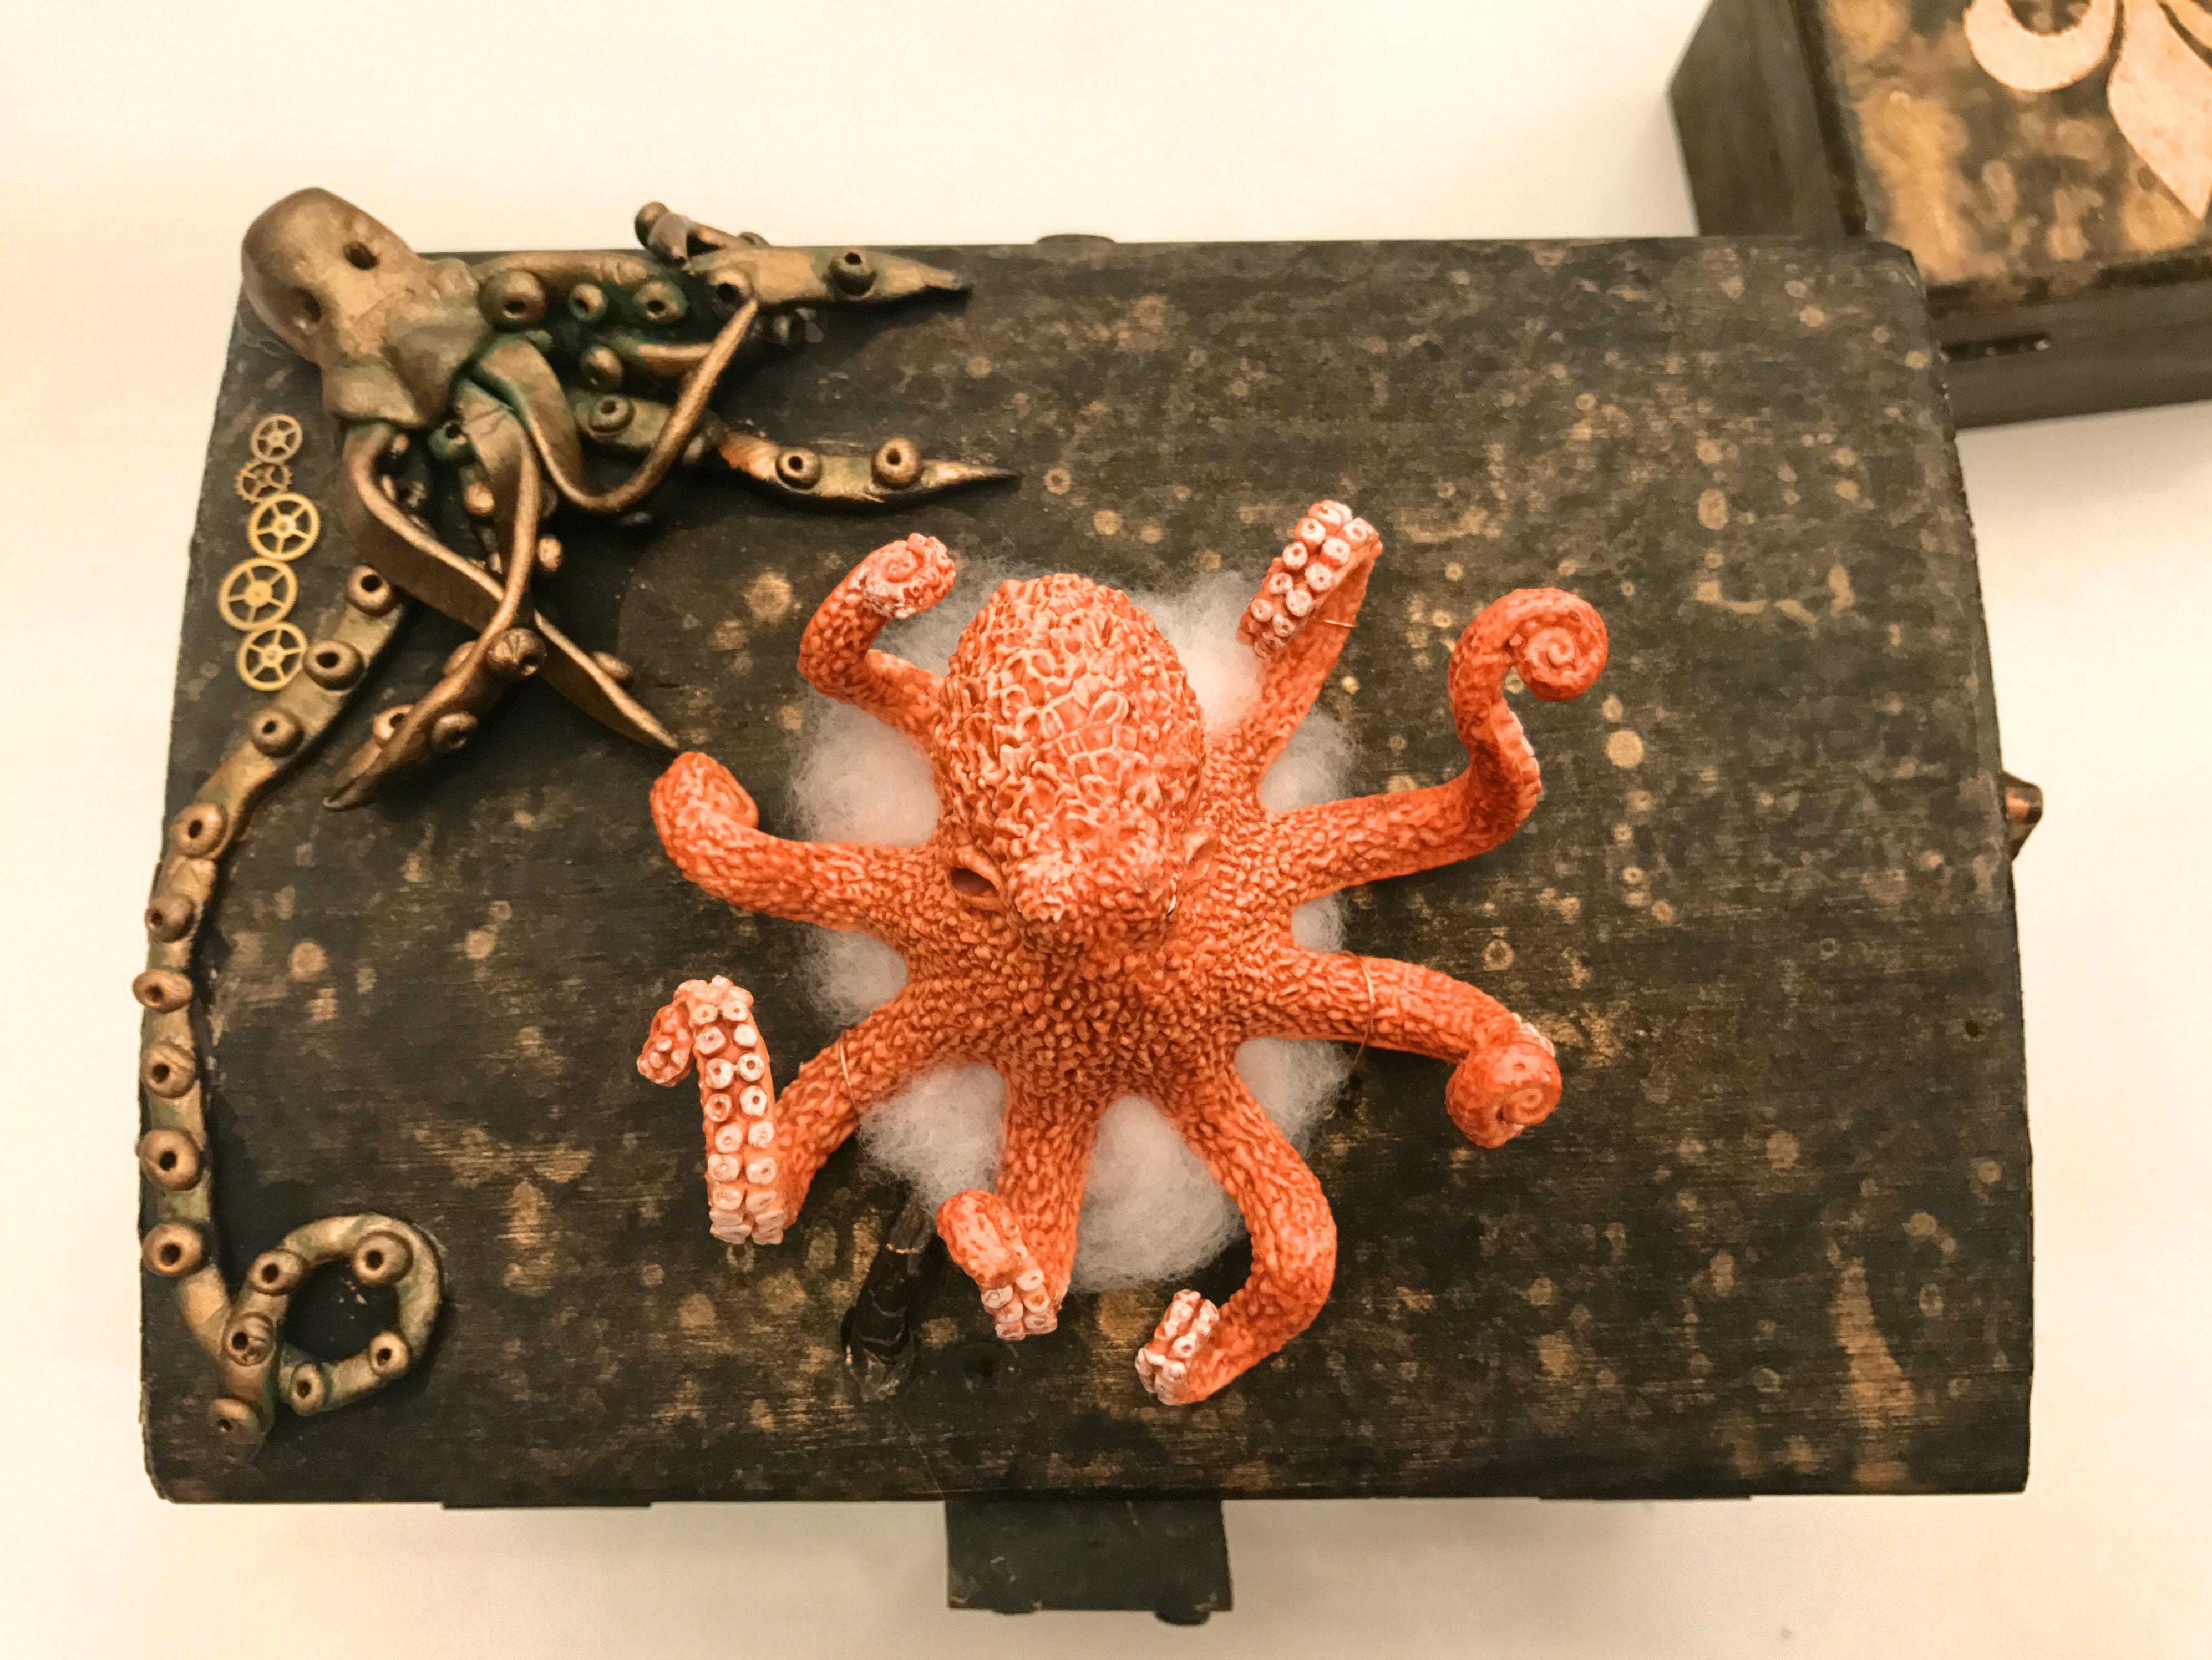 Alruna Lovelace Squidbox Top